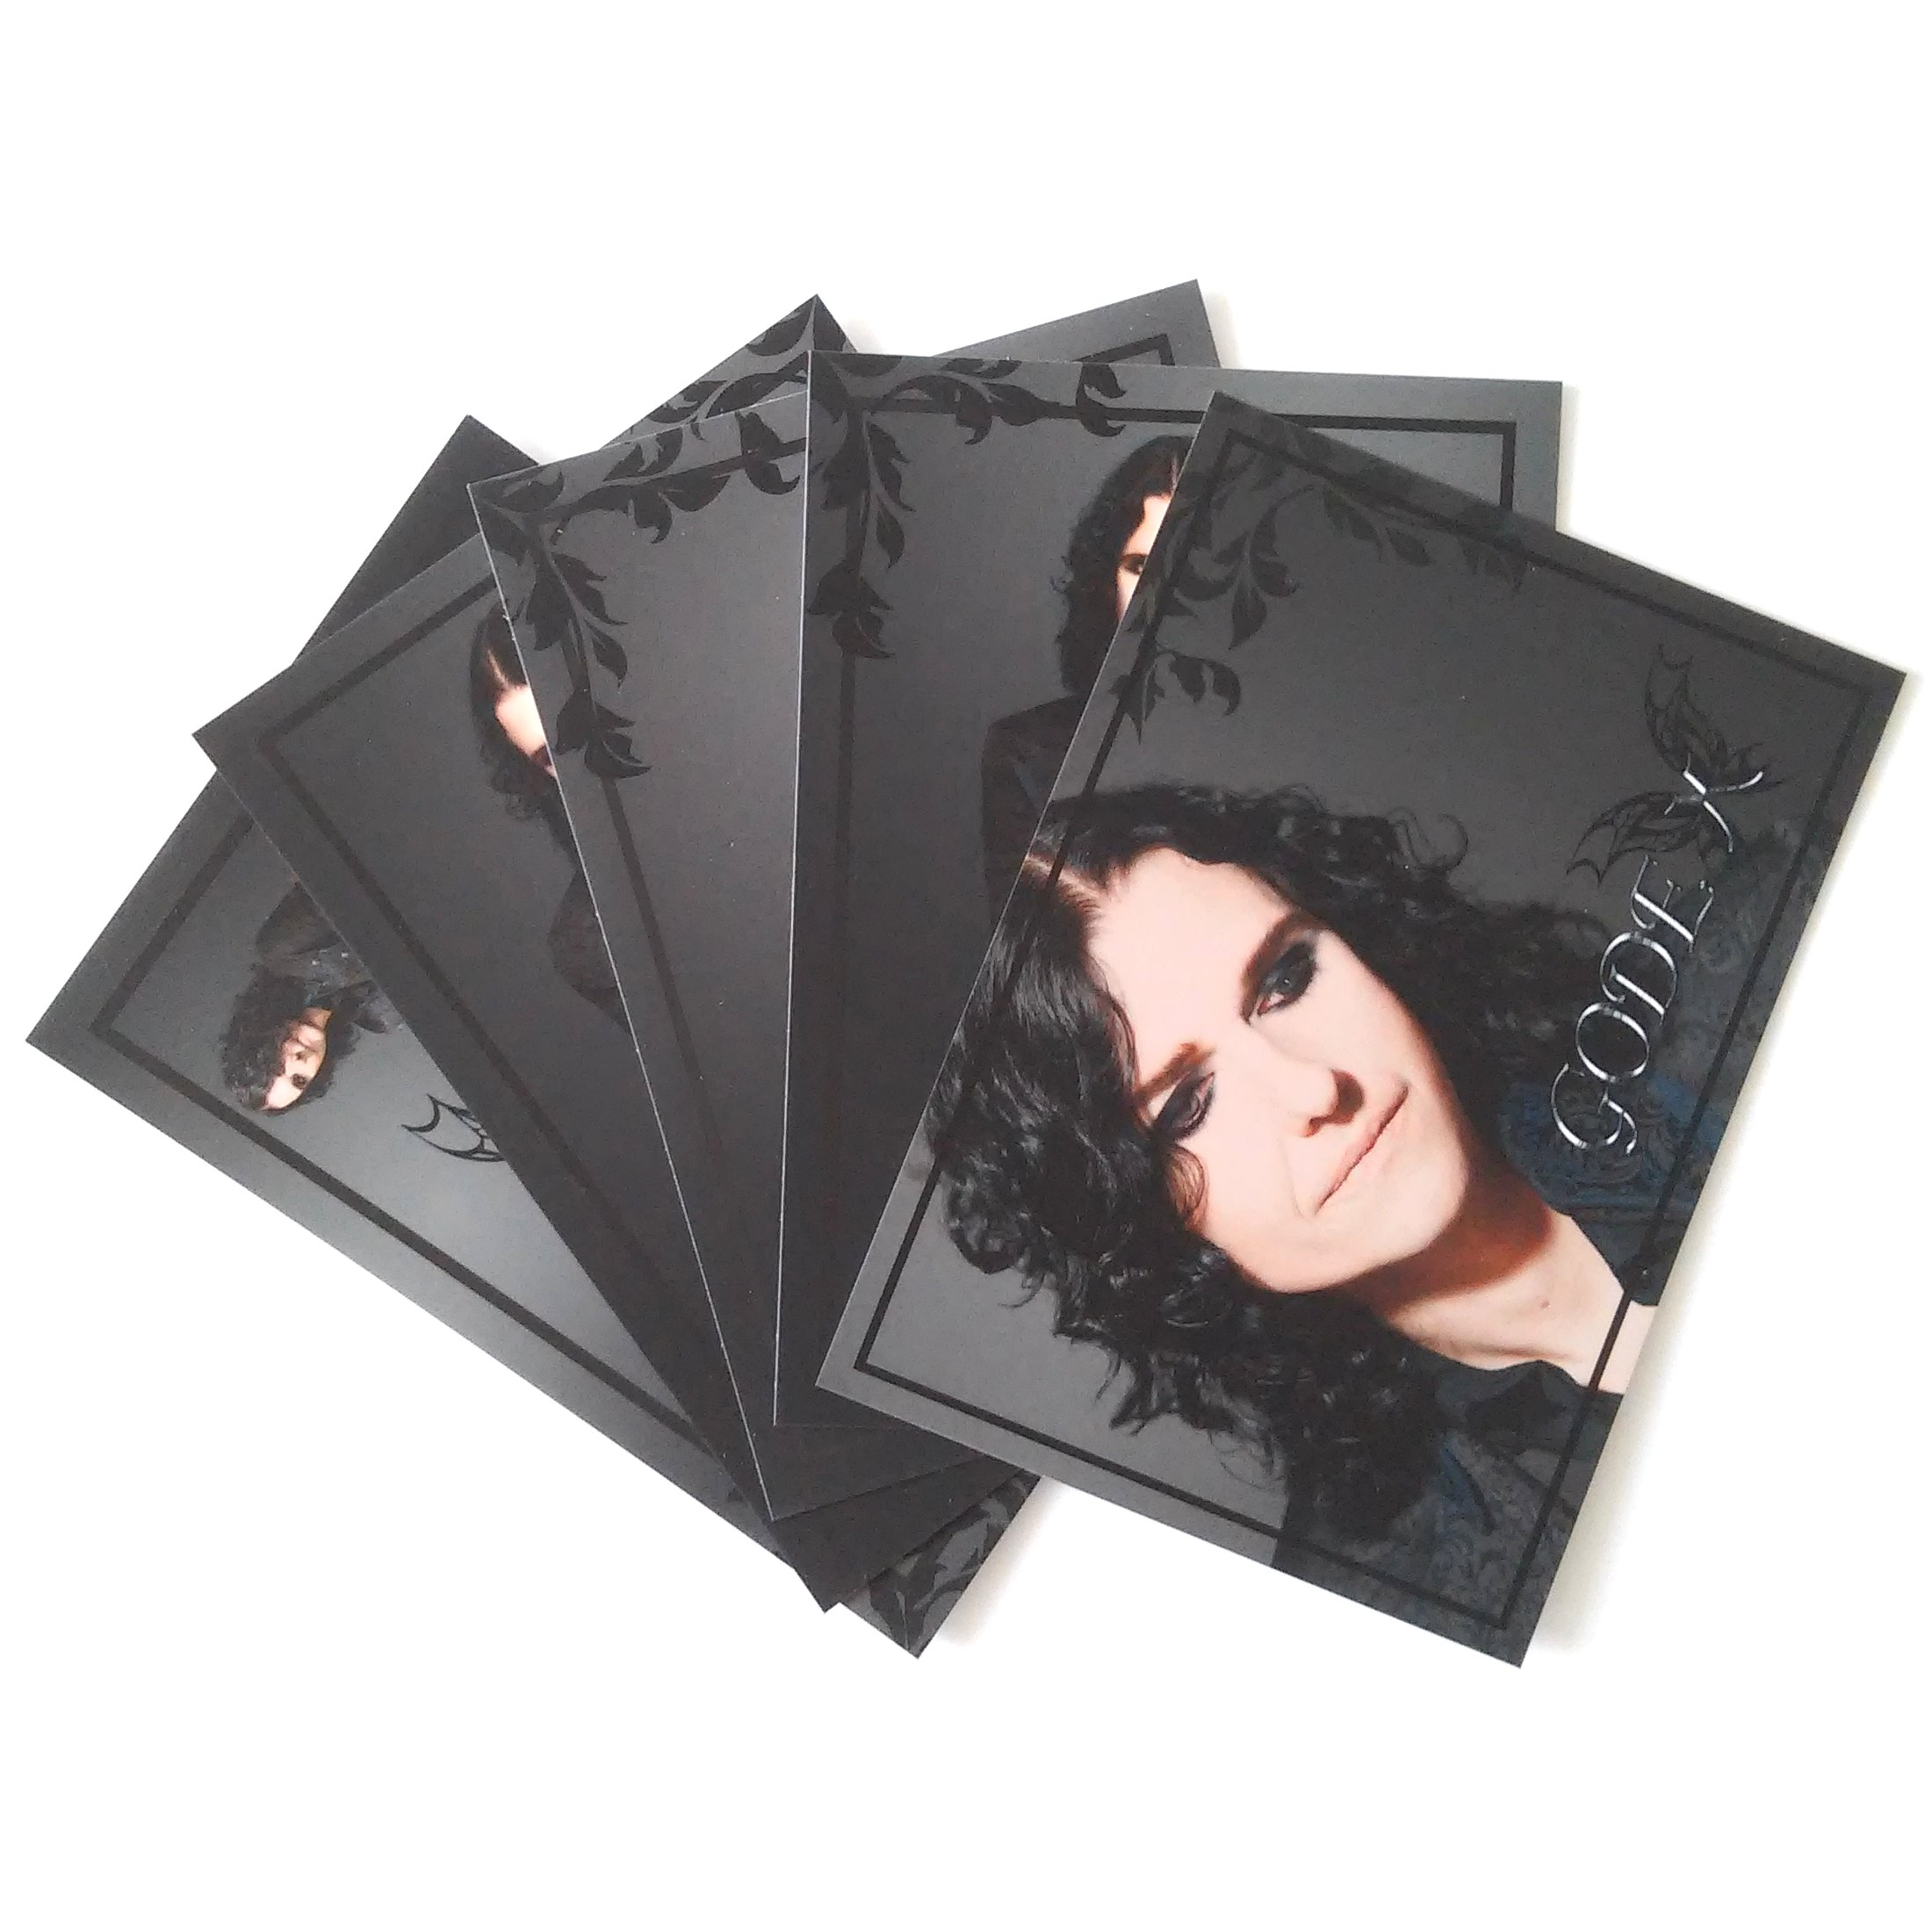 Postkarten (5 Stück)